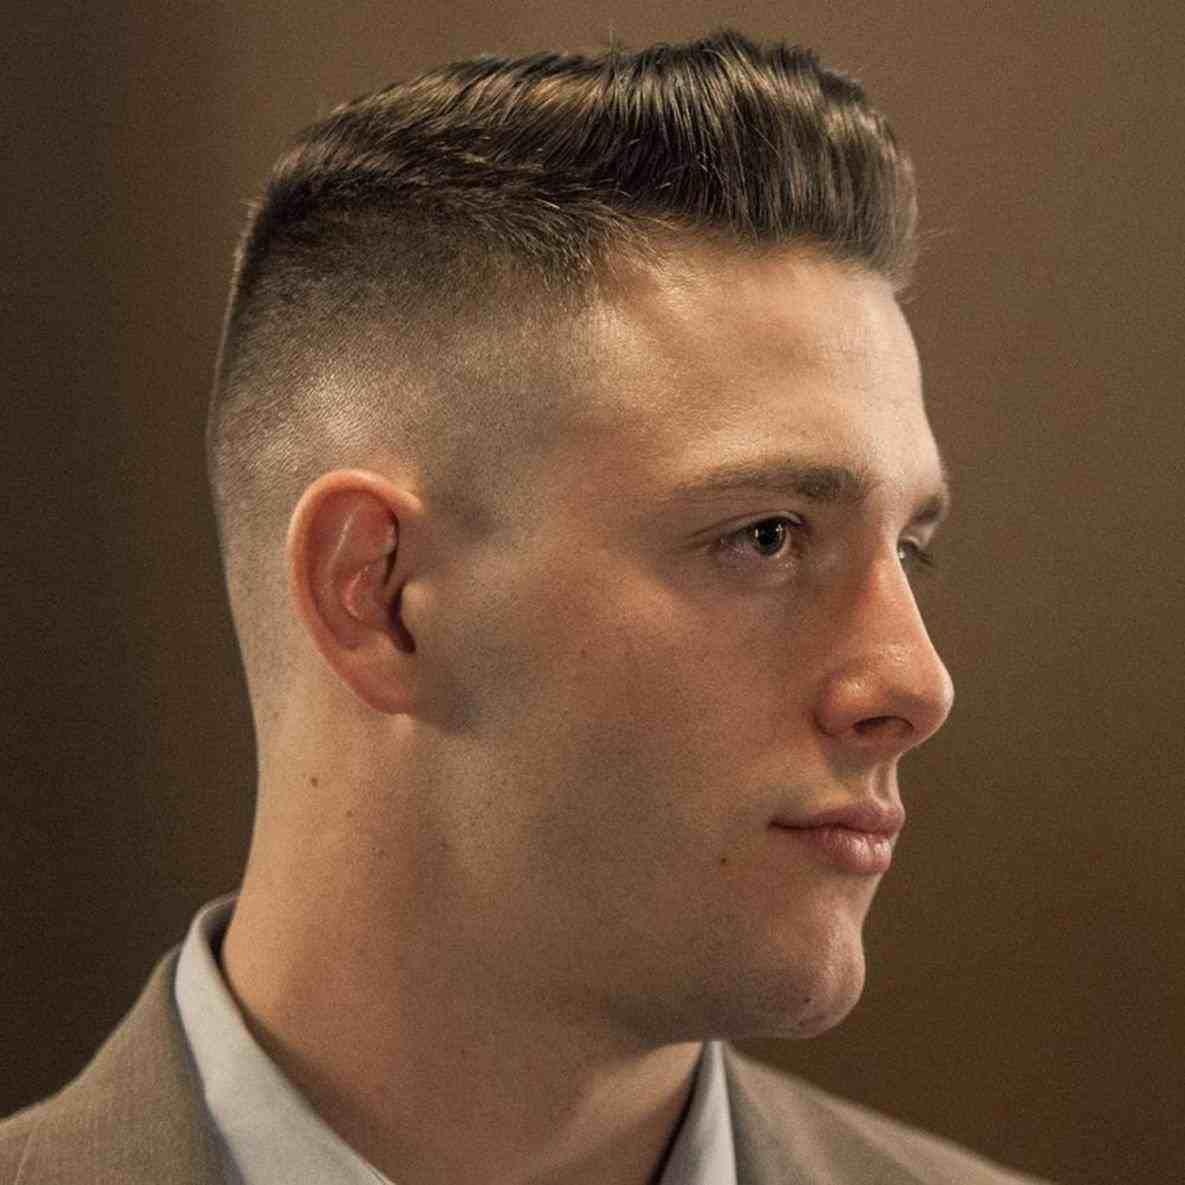 army haircut beckham | hair stylist and models | pinterest